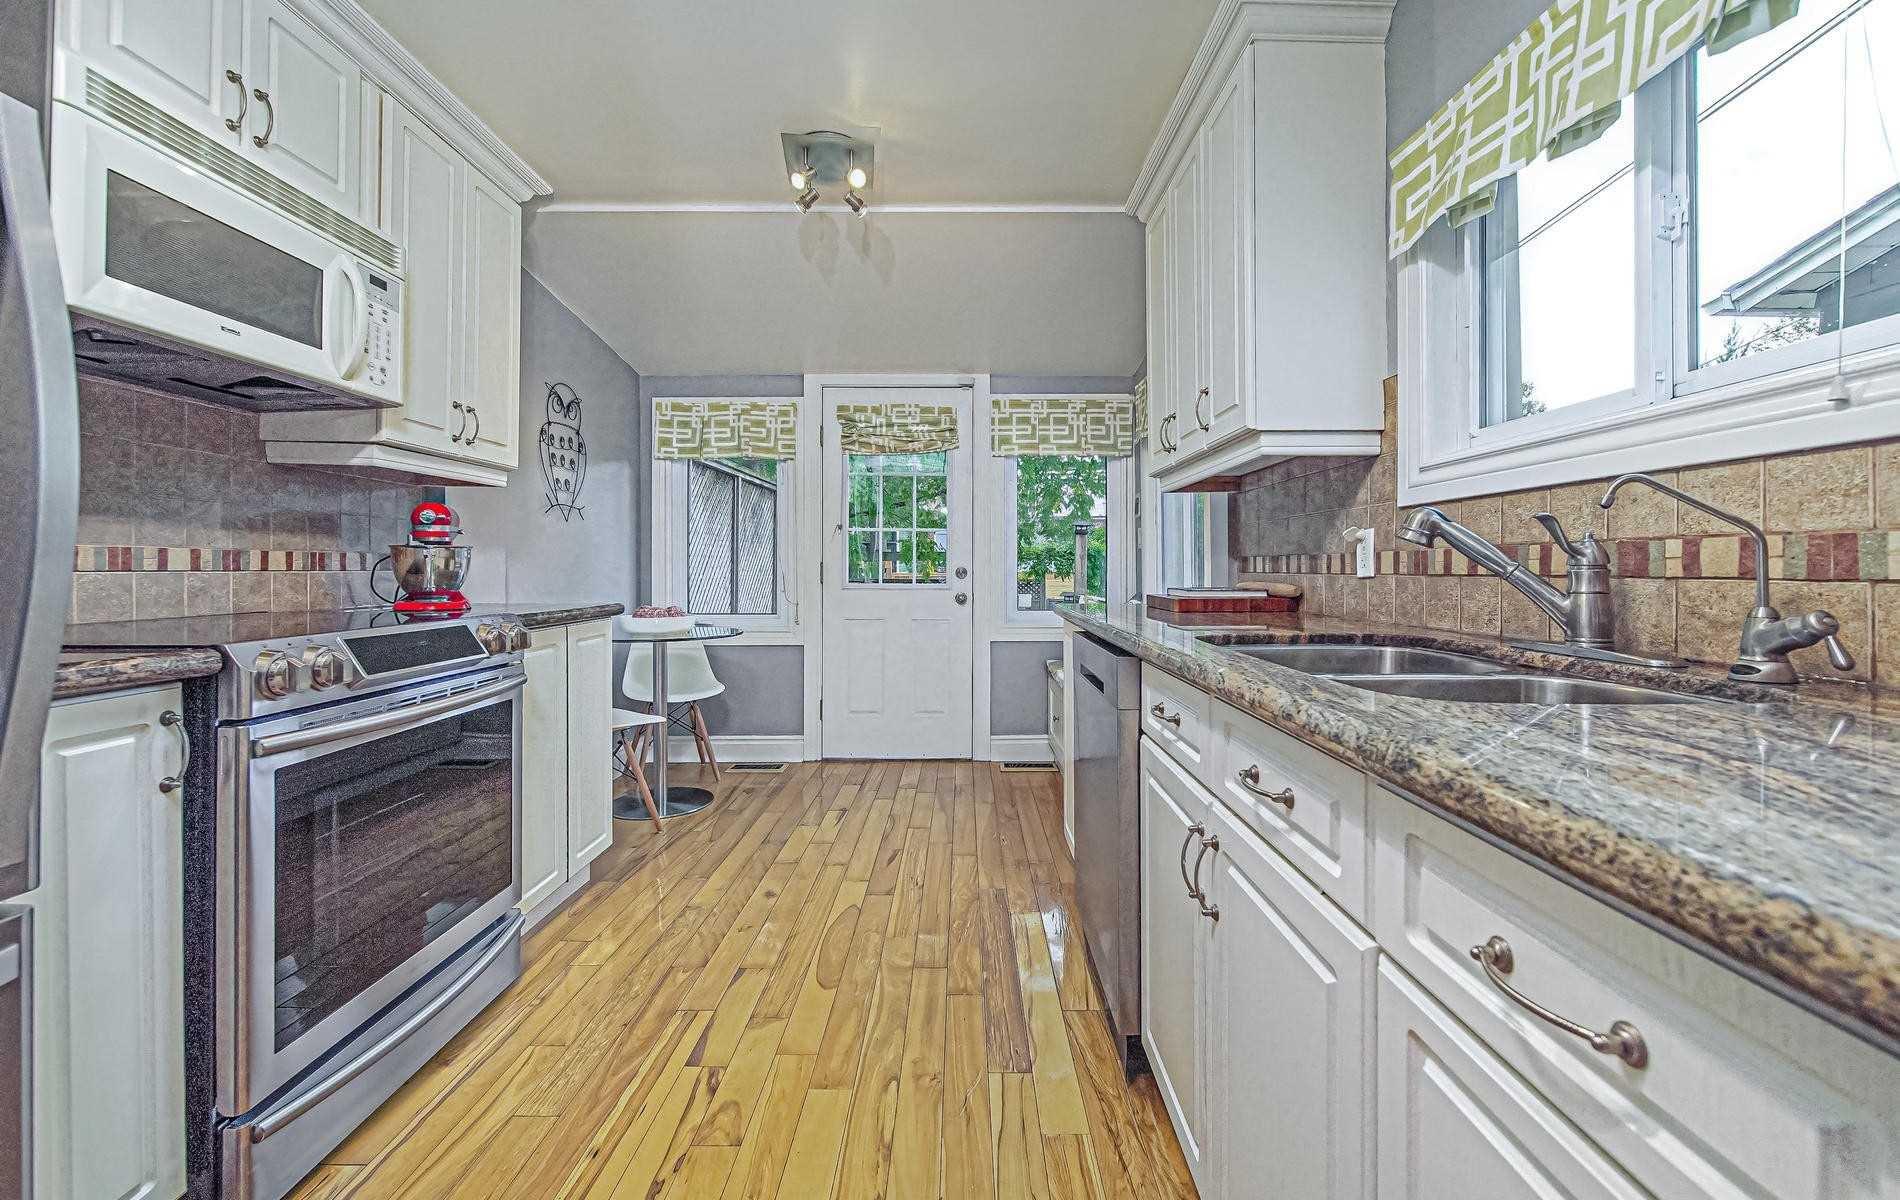 Photo 6: Photos: 84 Rushbrooke Avenue in Toronto: South Riverdale House (2-Storey) for sale (Toronto E01)  : MLS®# E4600791